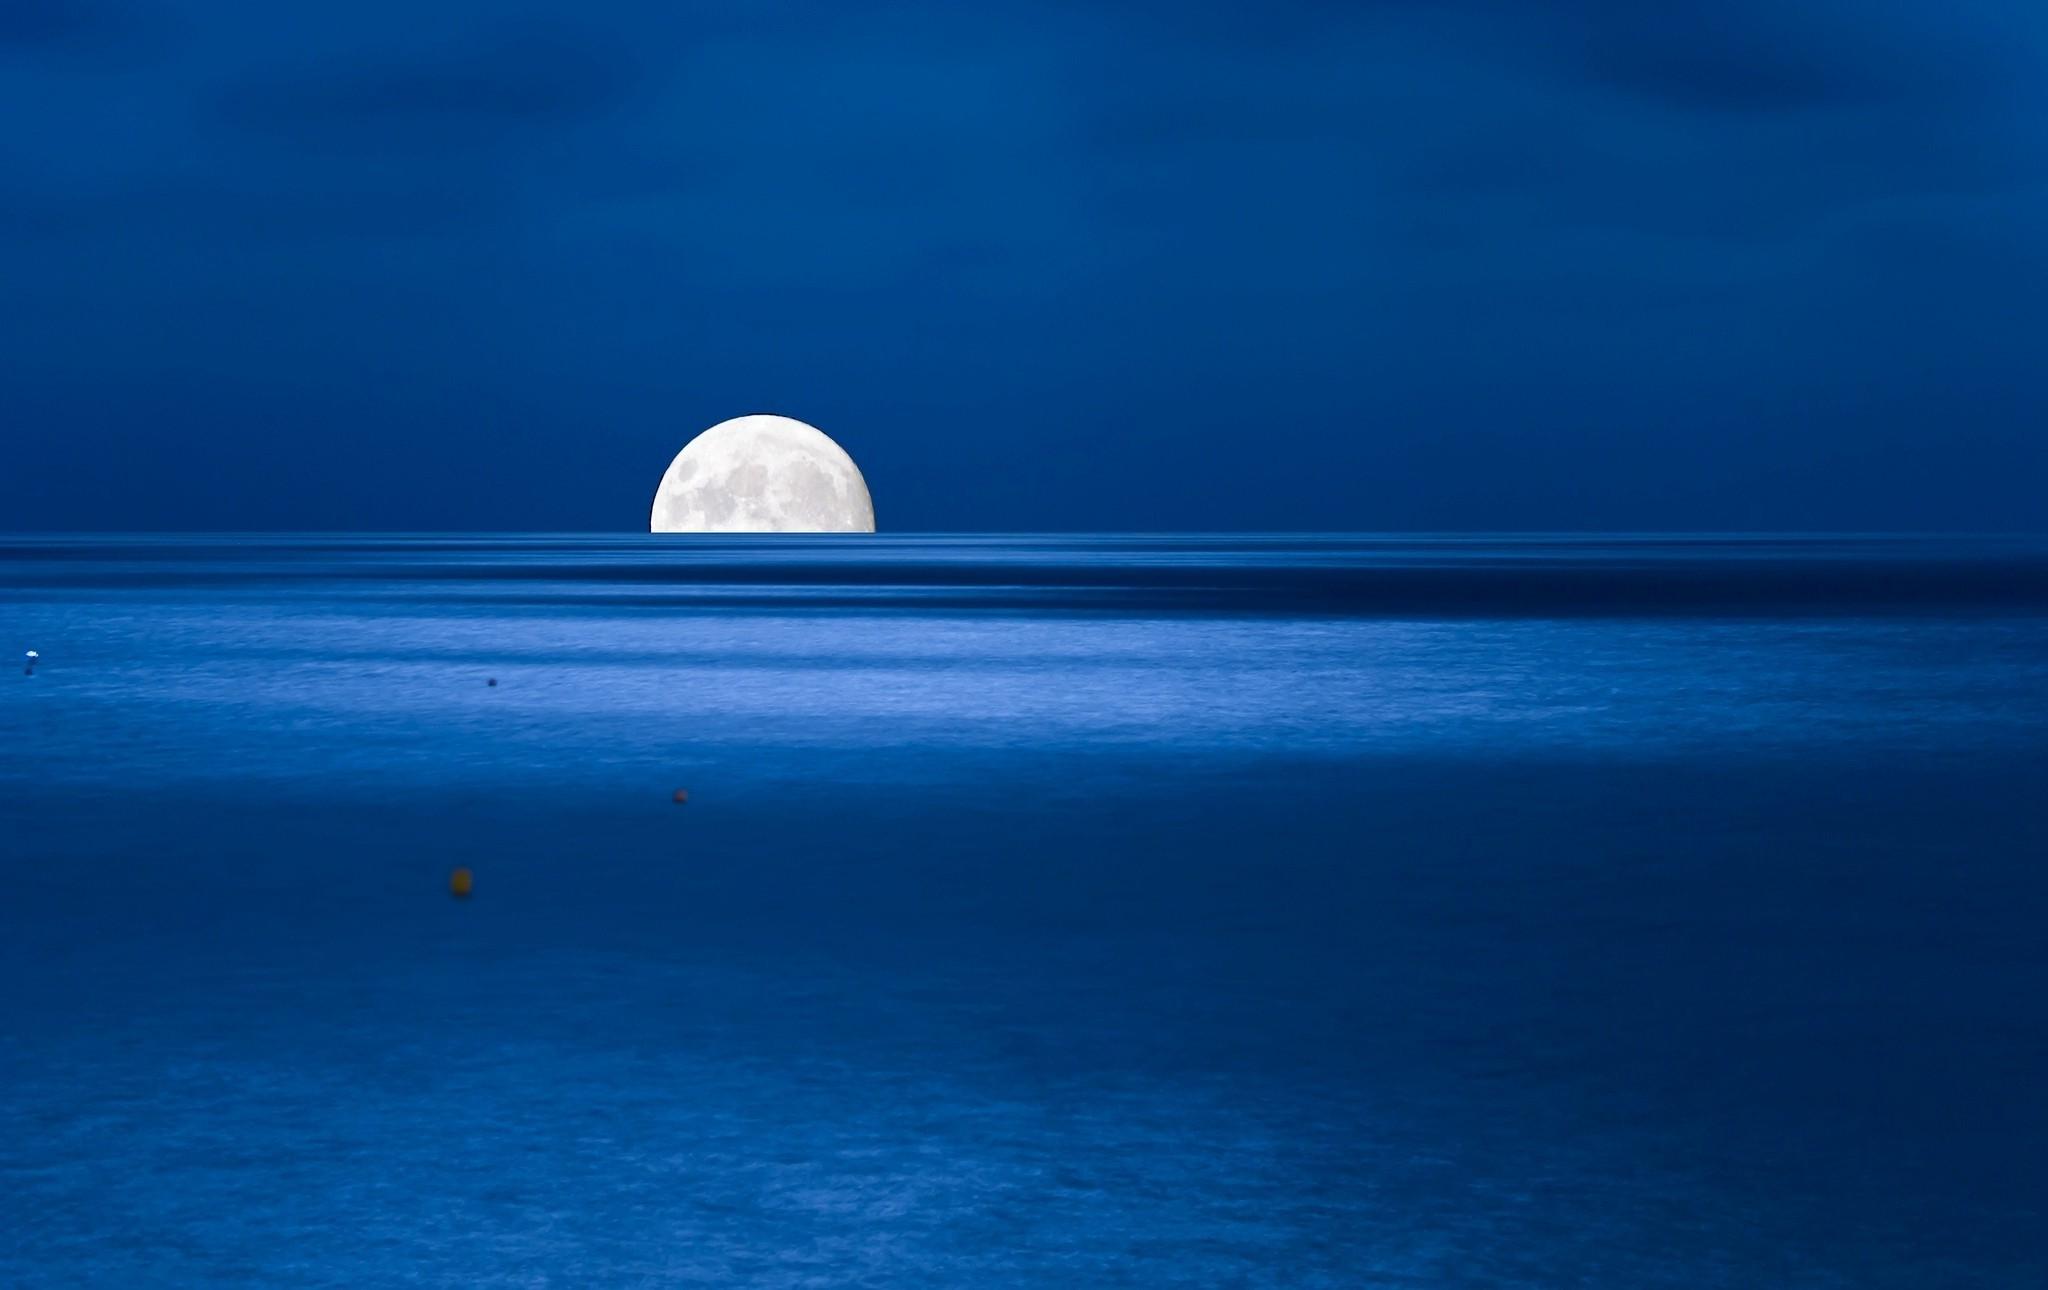 wallpaper : sunlight, sea, night, water, nature, reflection, sky